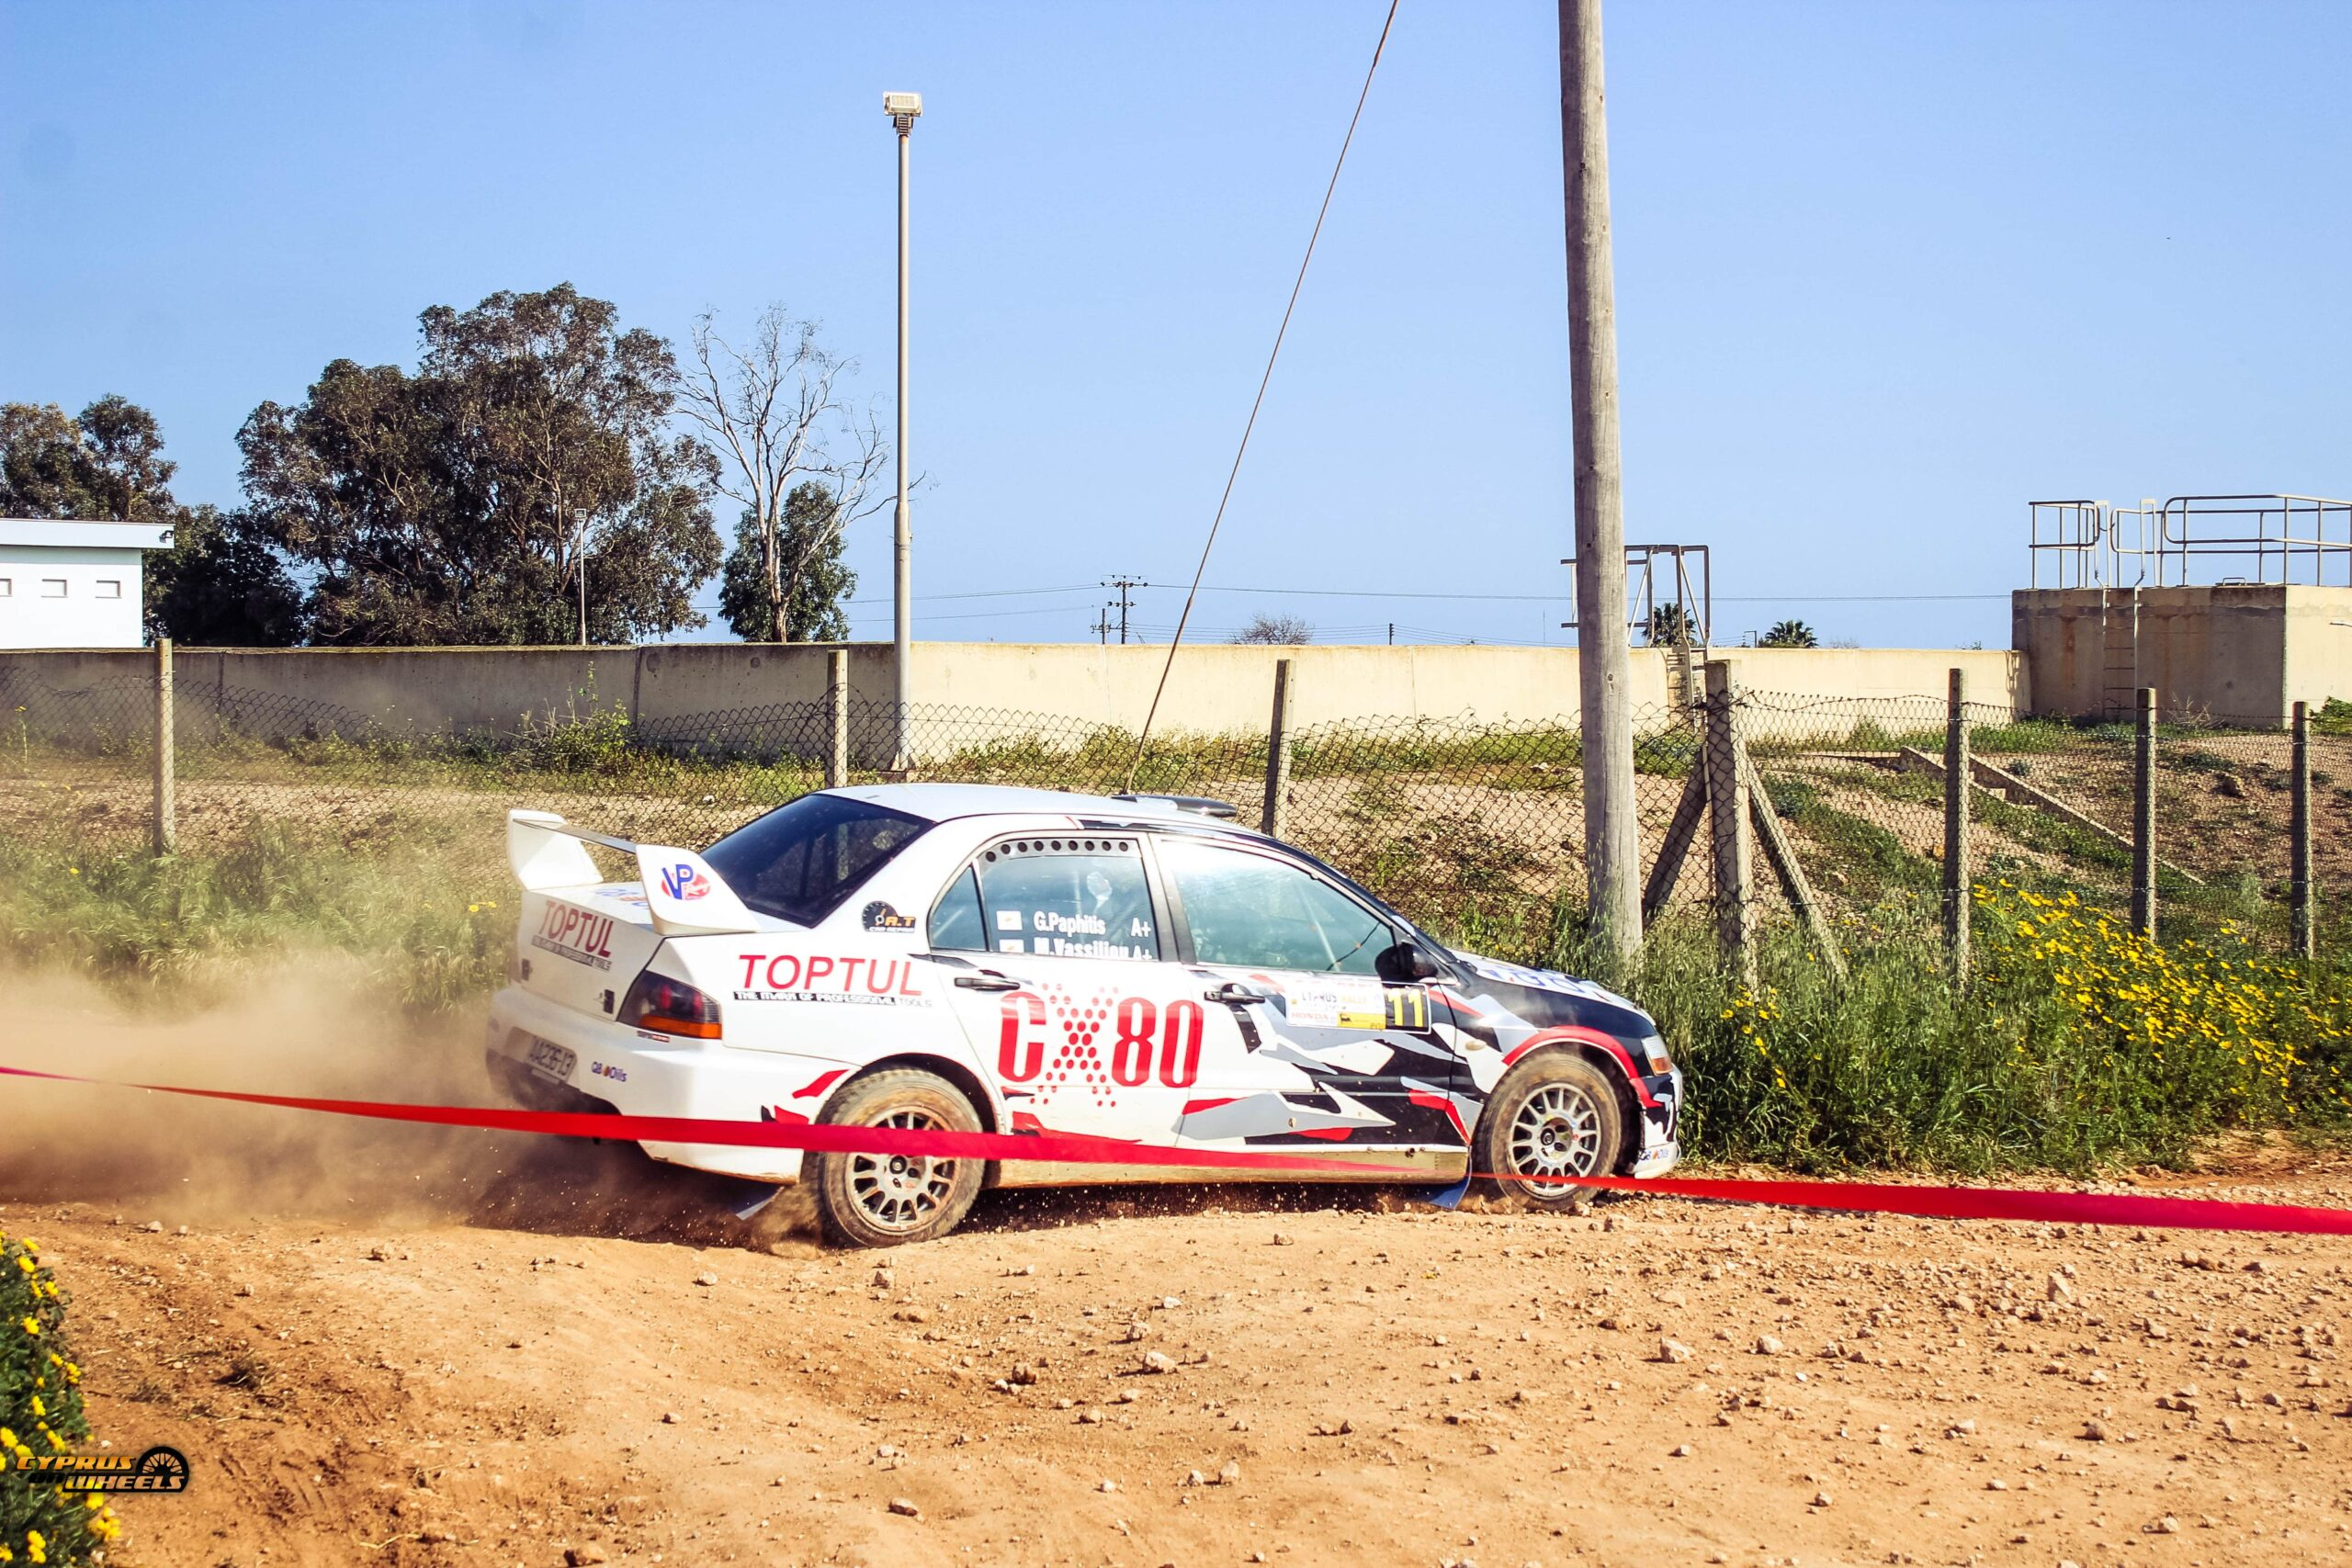 evo 7 rally car